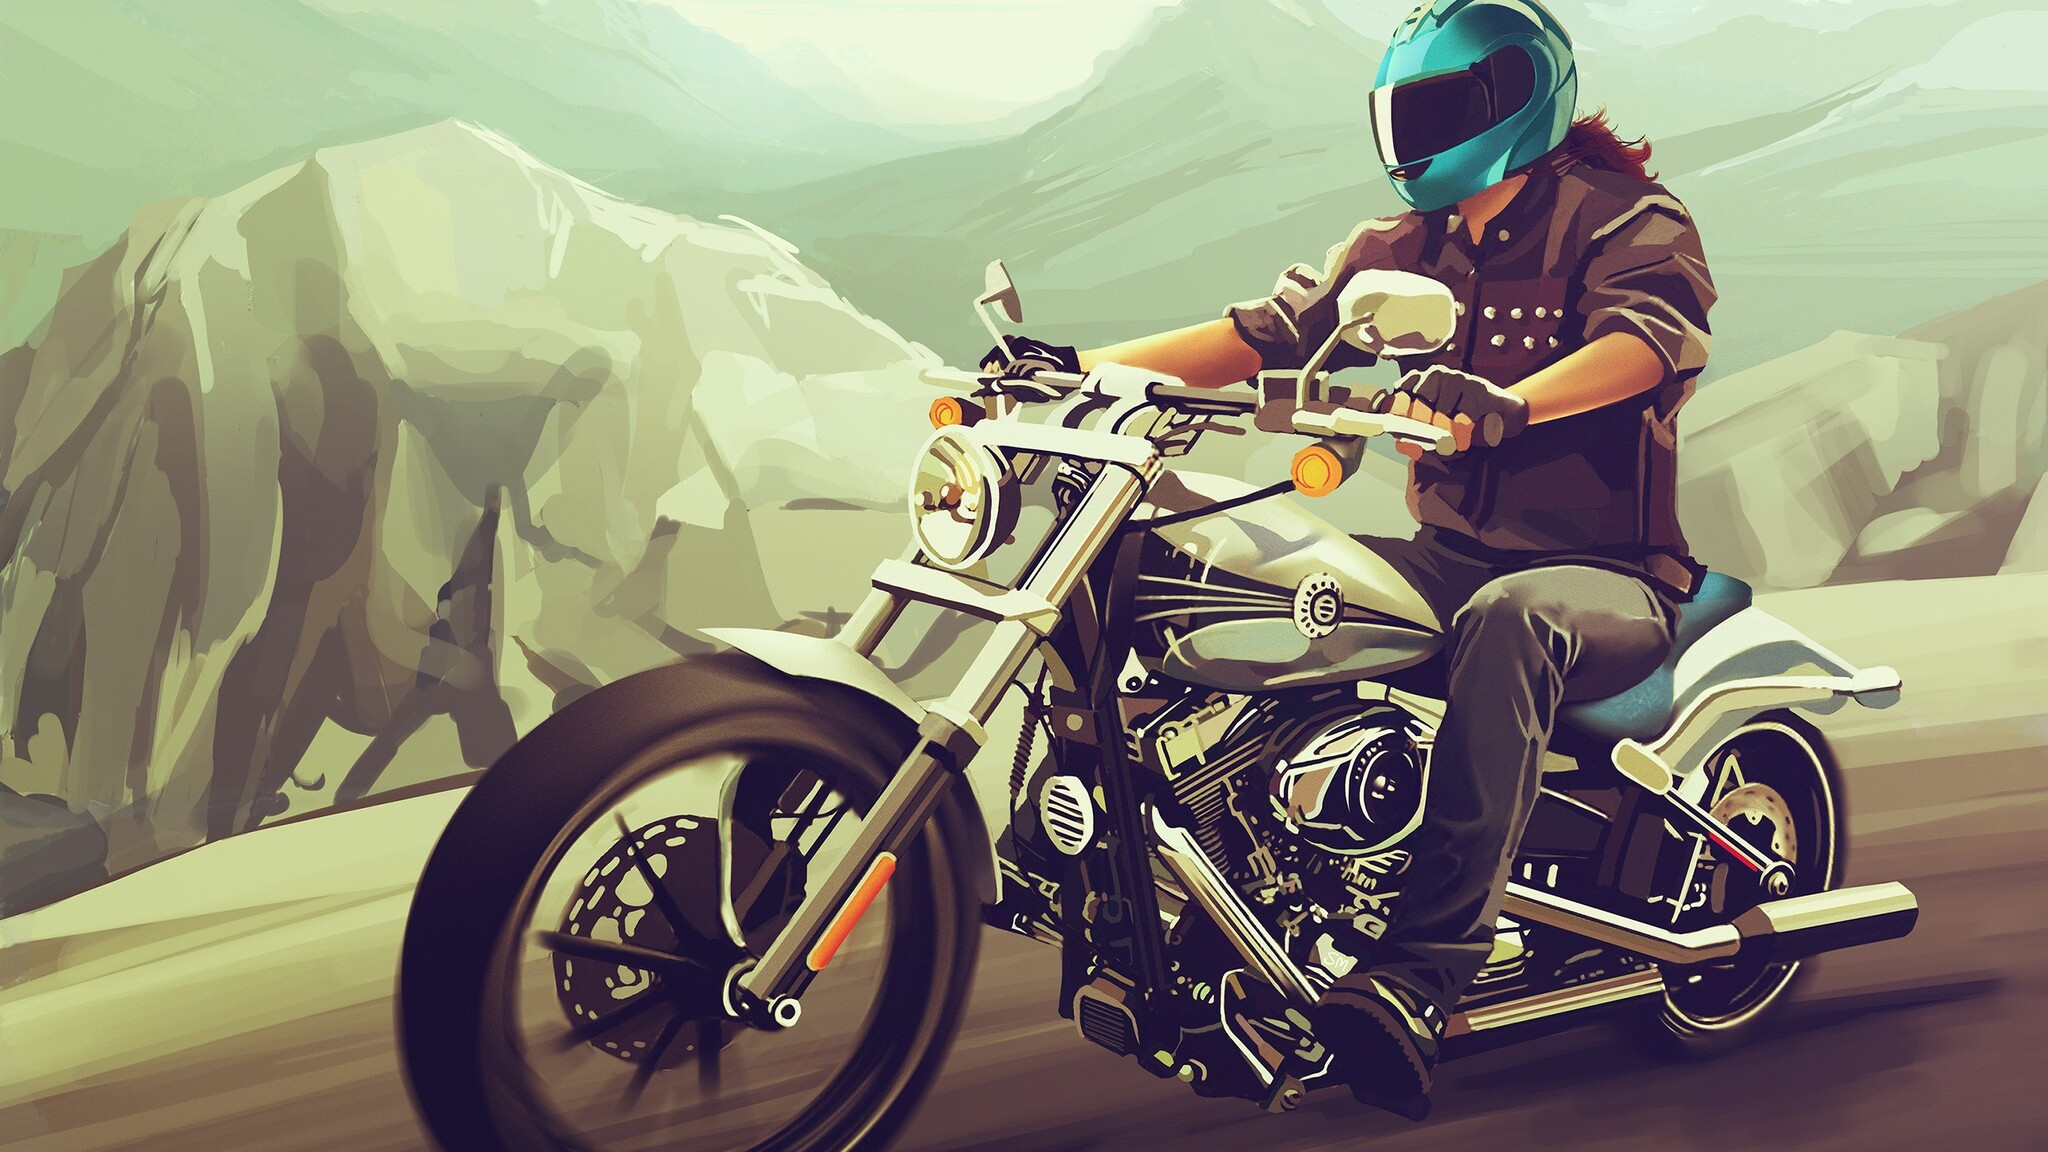 2048x1152 Pubg Fan Art 2048x1152 Resolution Hd 4k: 2048x1152 Harley Davidson Fan Art 2048x1152 Resolution HD